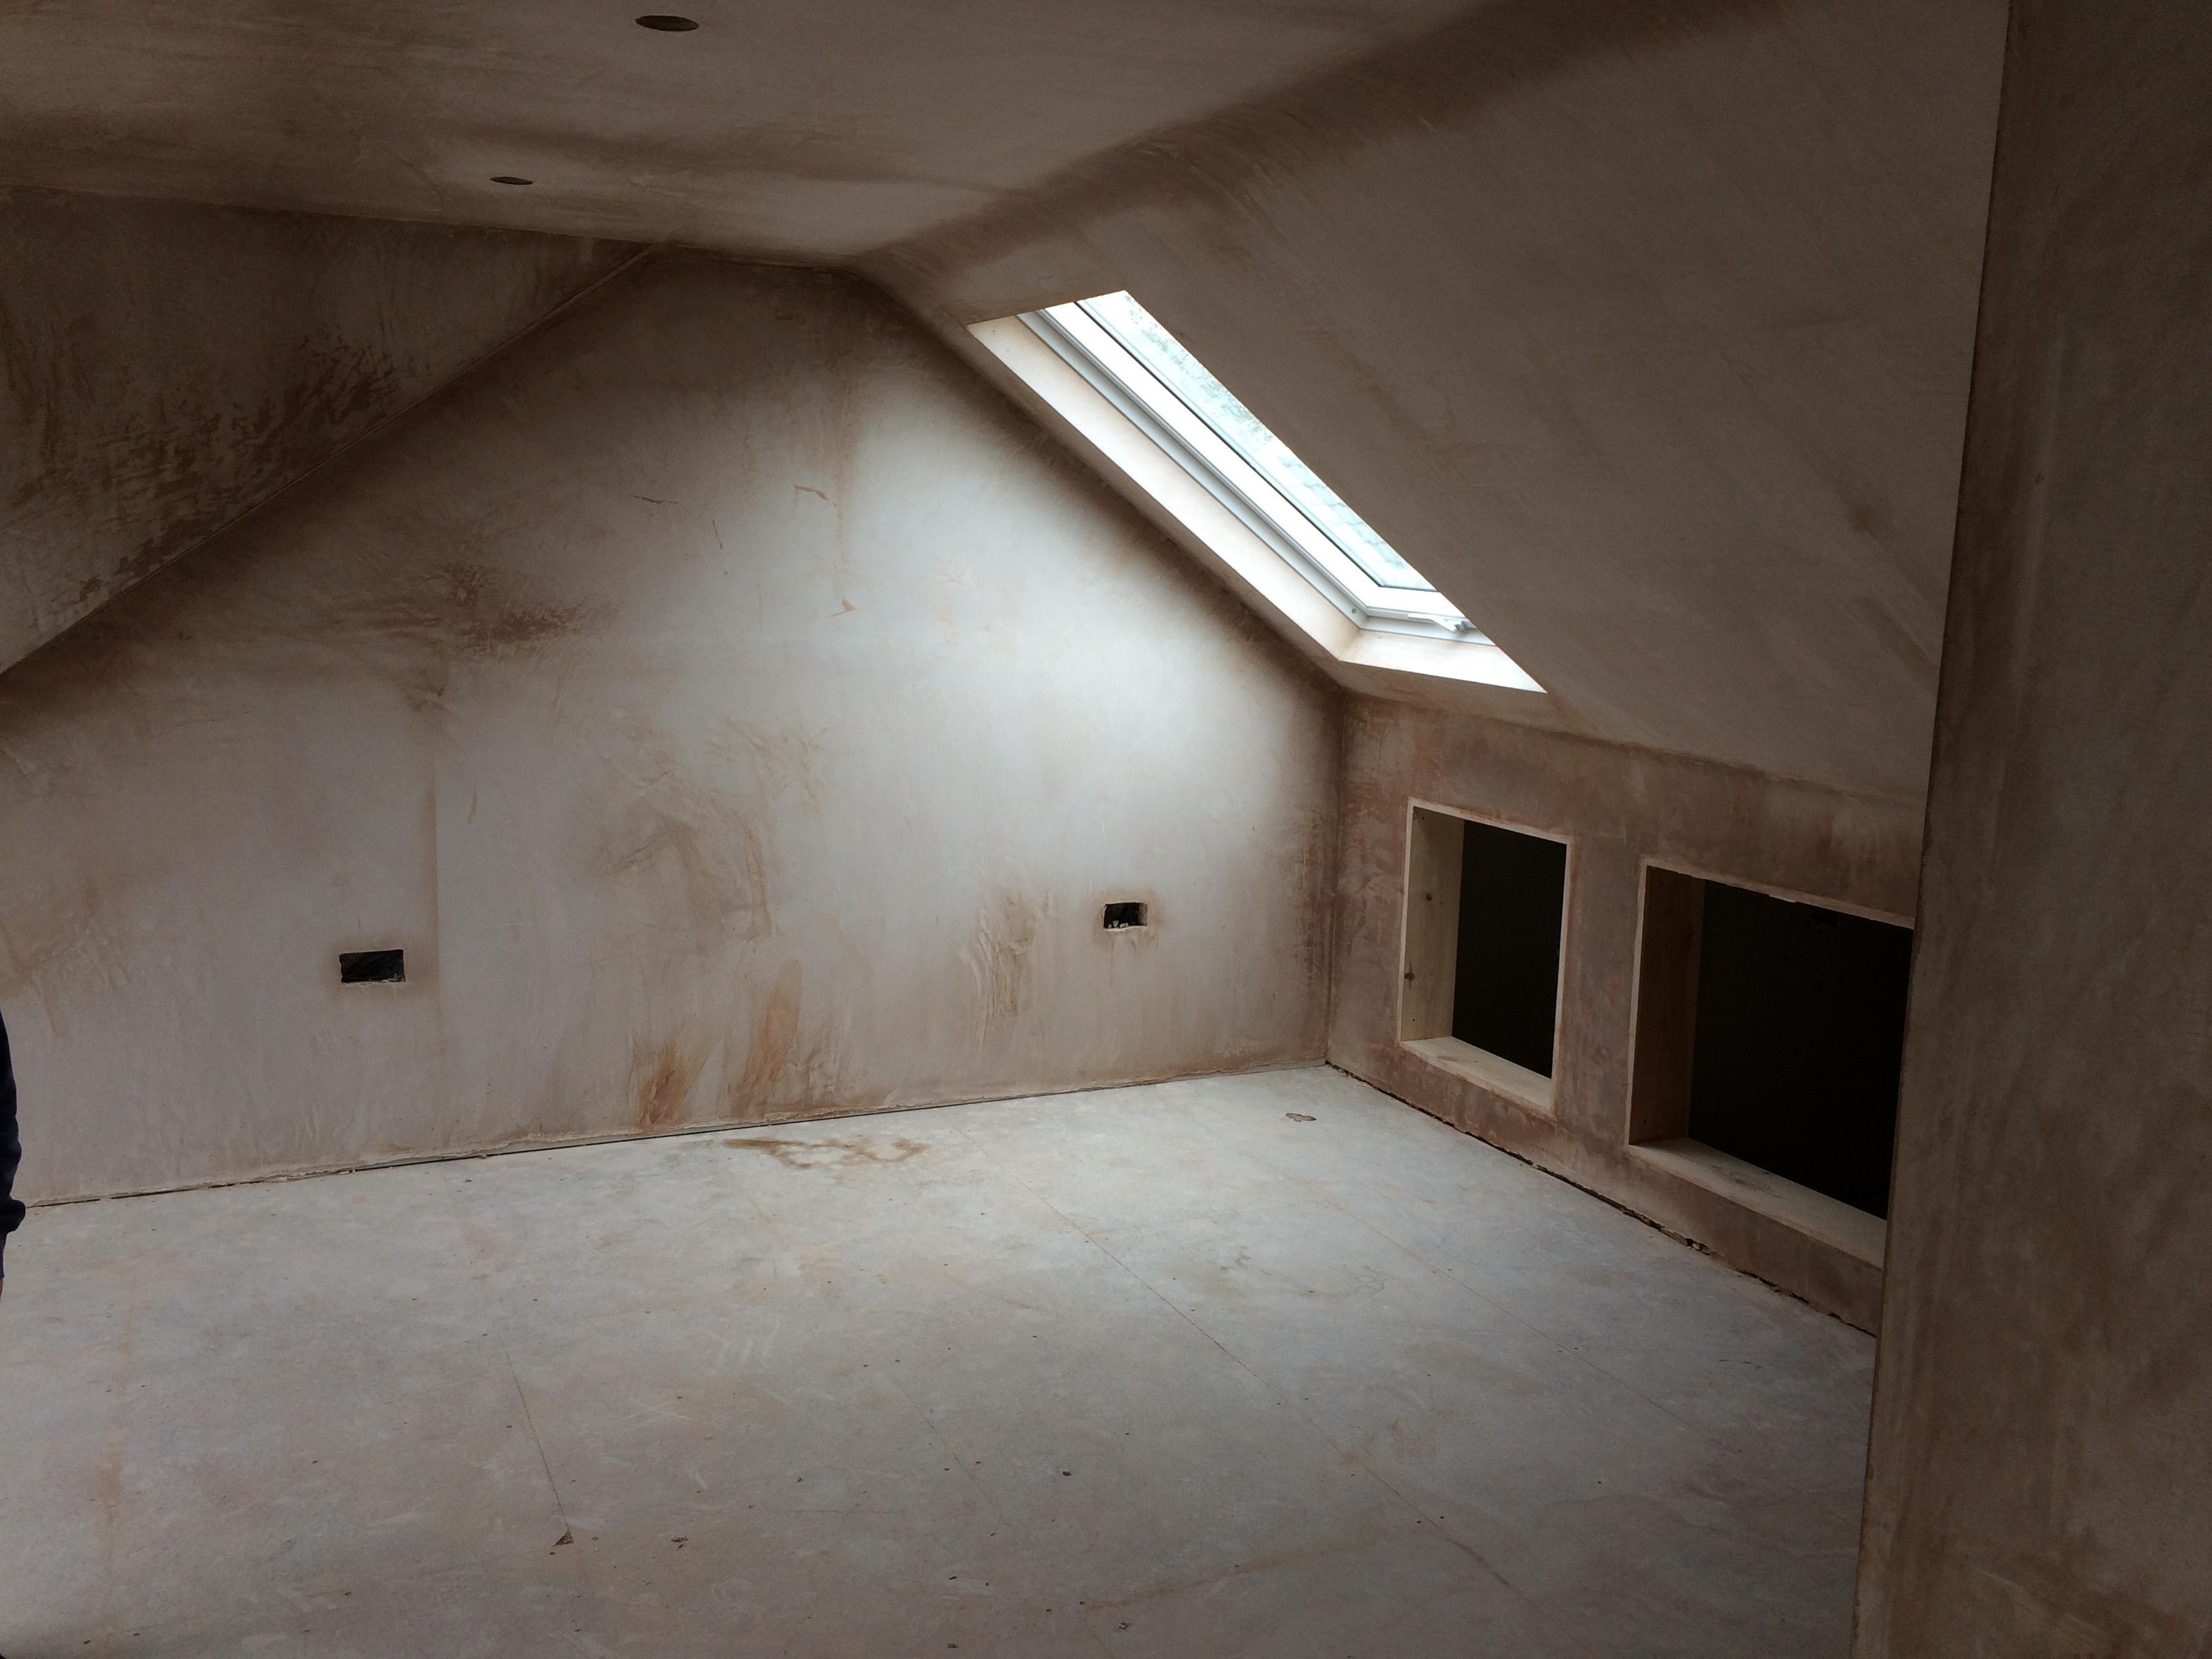 Flat Roofing Amp Loft Coversions In North Devon Jamie